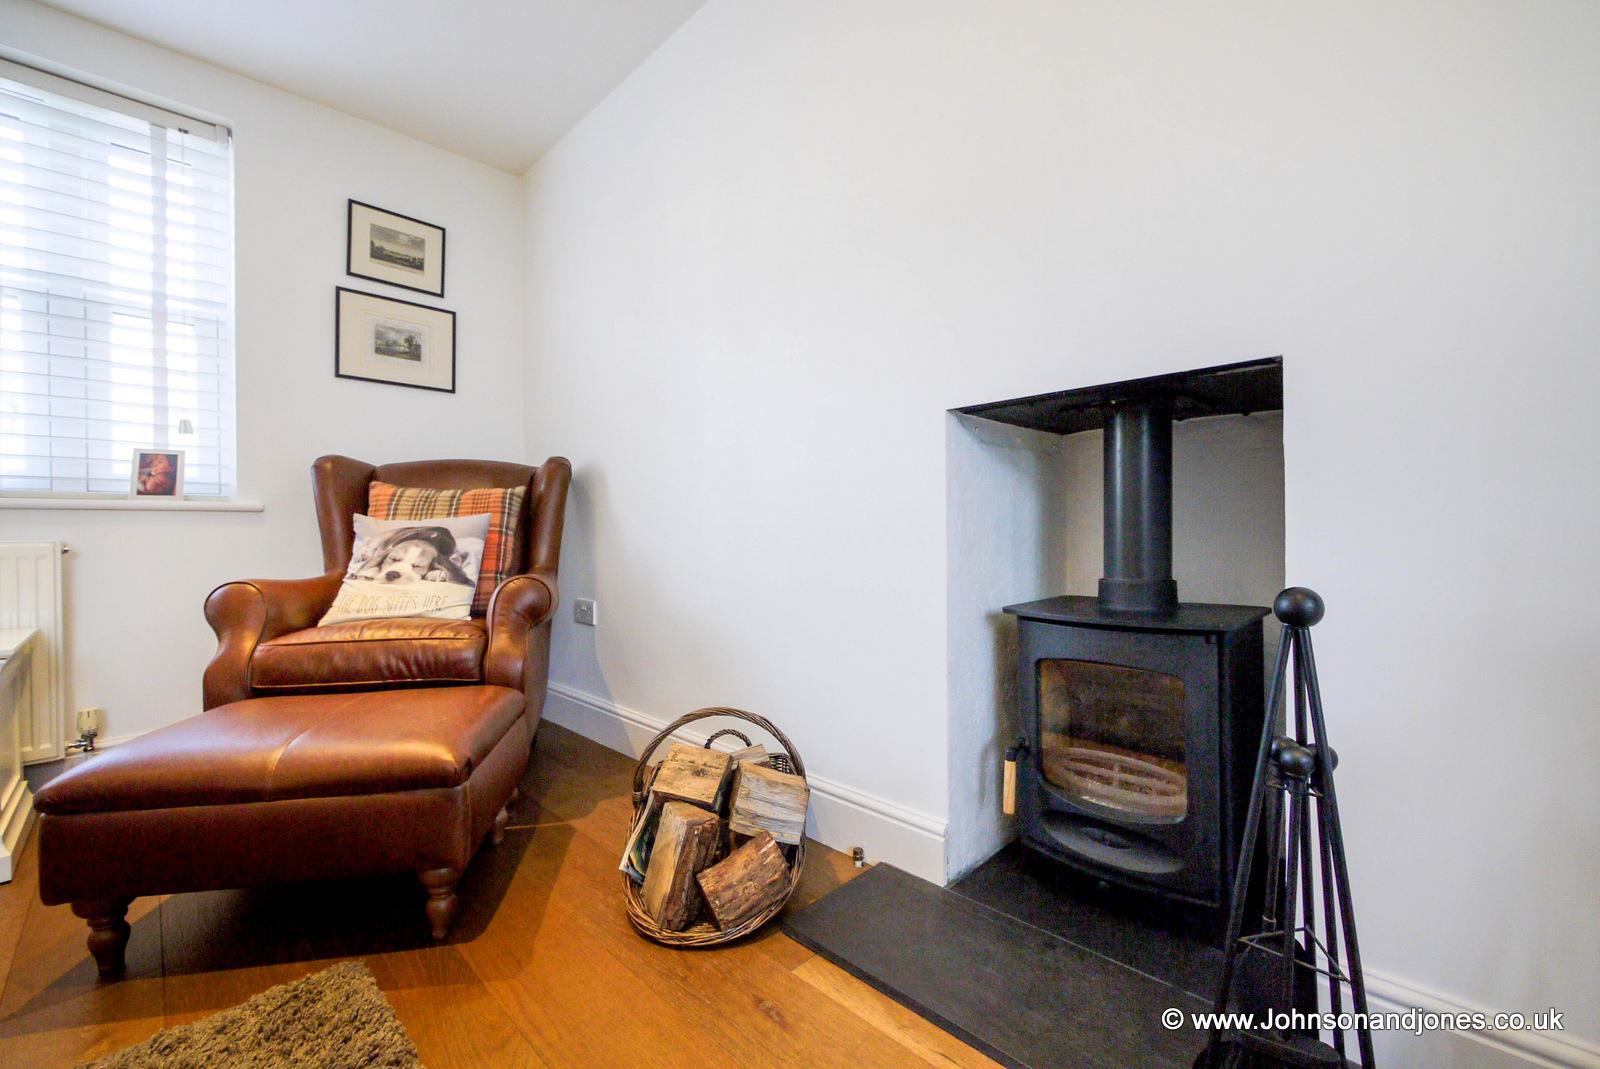 Property In Willow Walk Chertsey Surrey Kt16 8rg